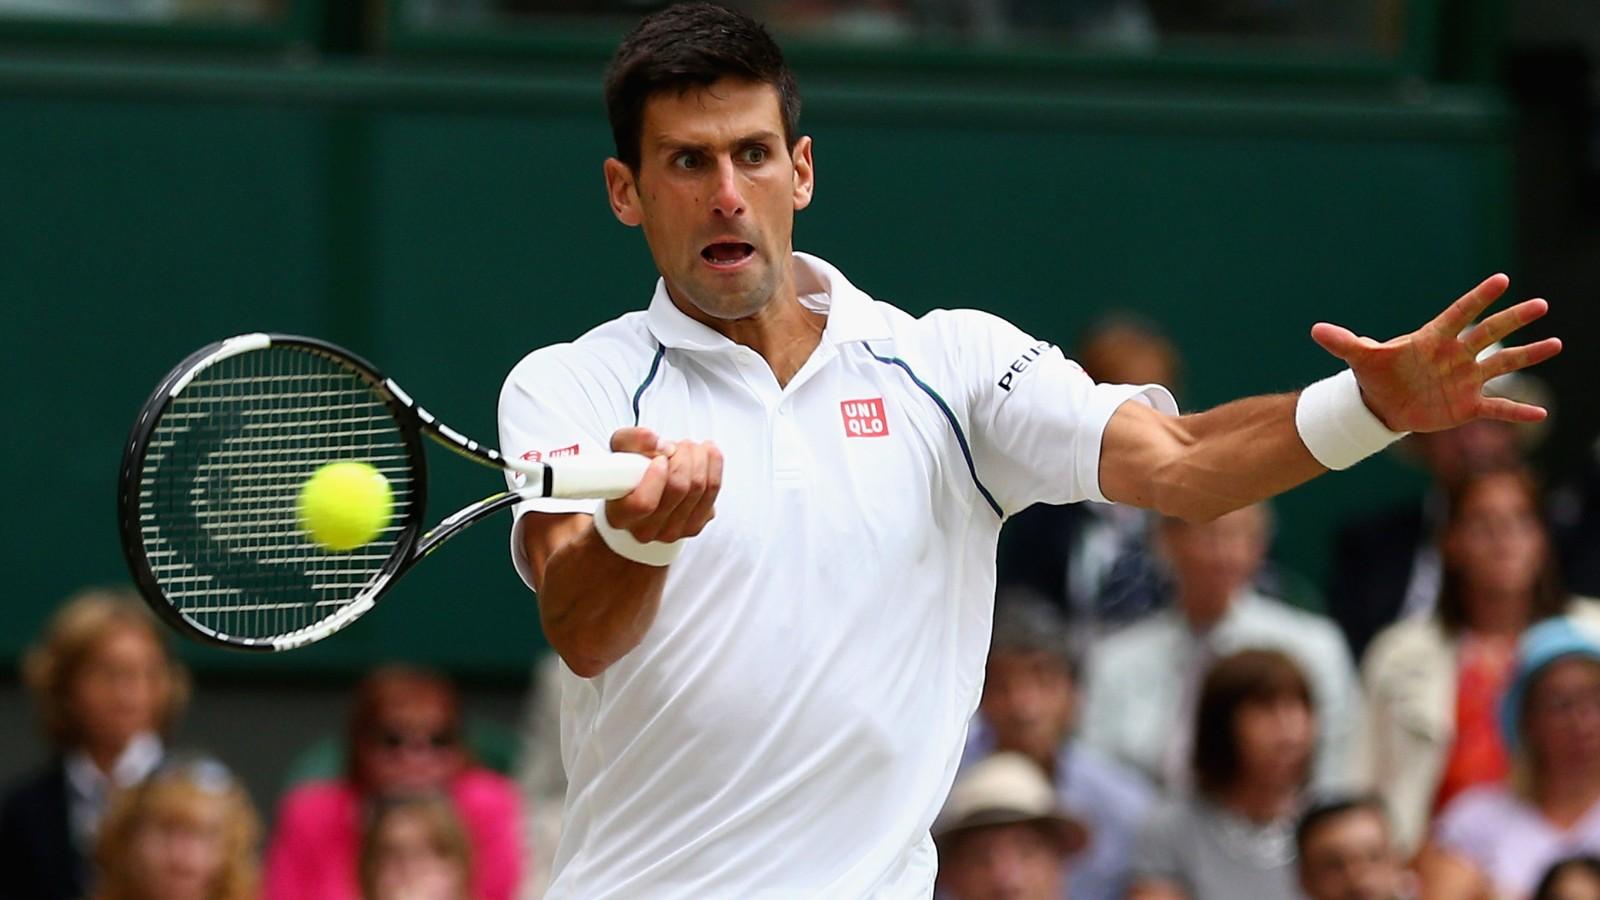 Wimbledon draw: Djokovic, Federer in same half - CNN